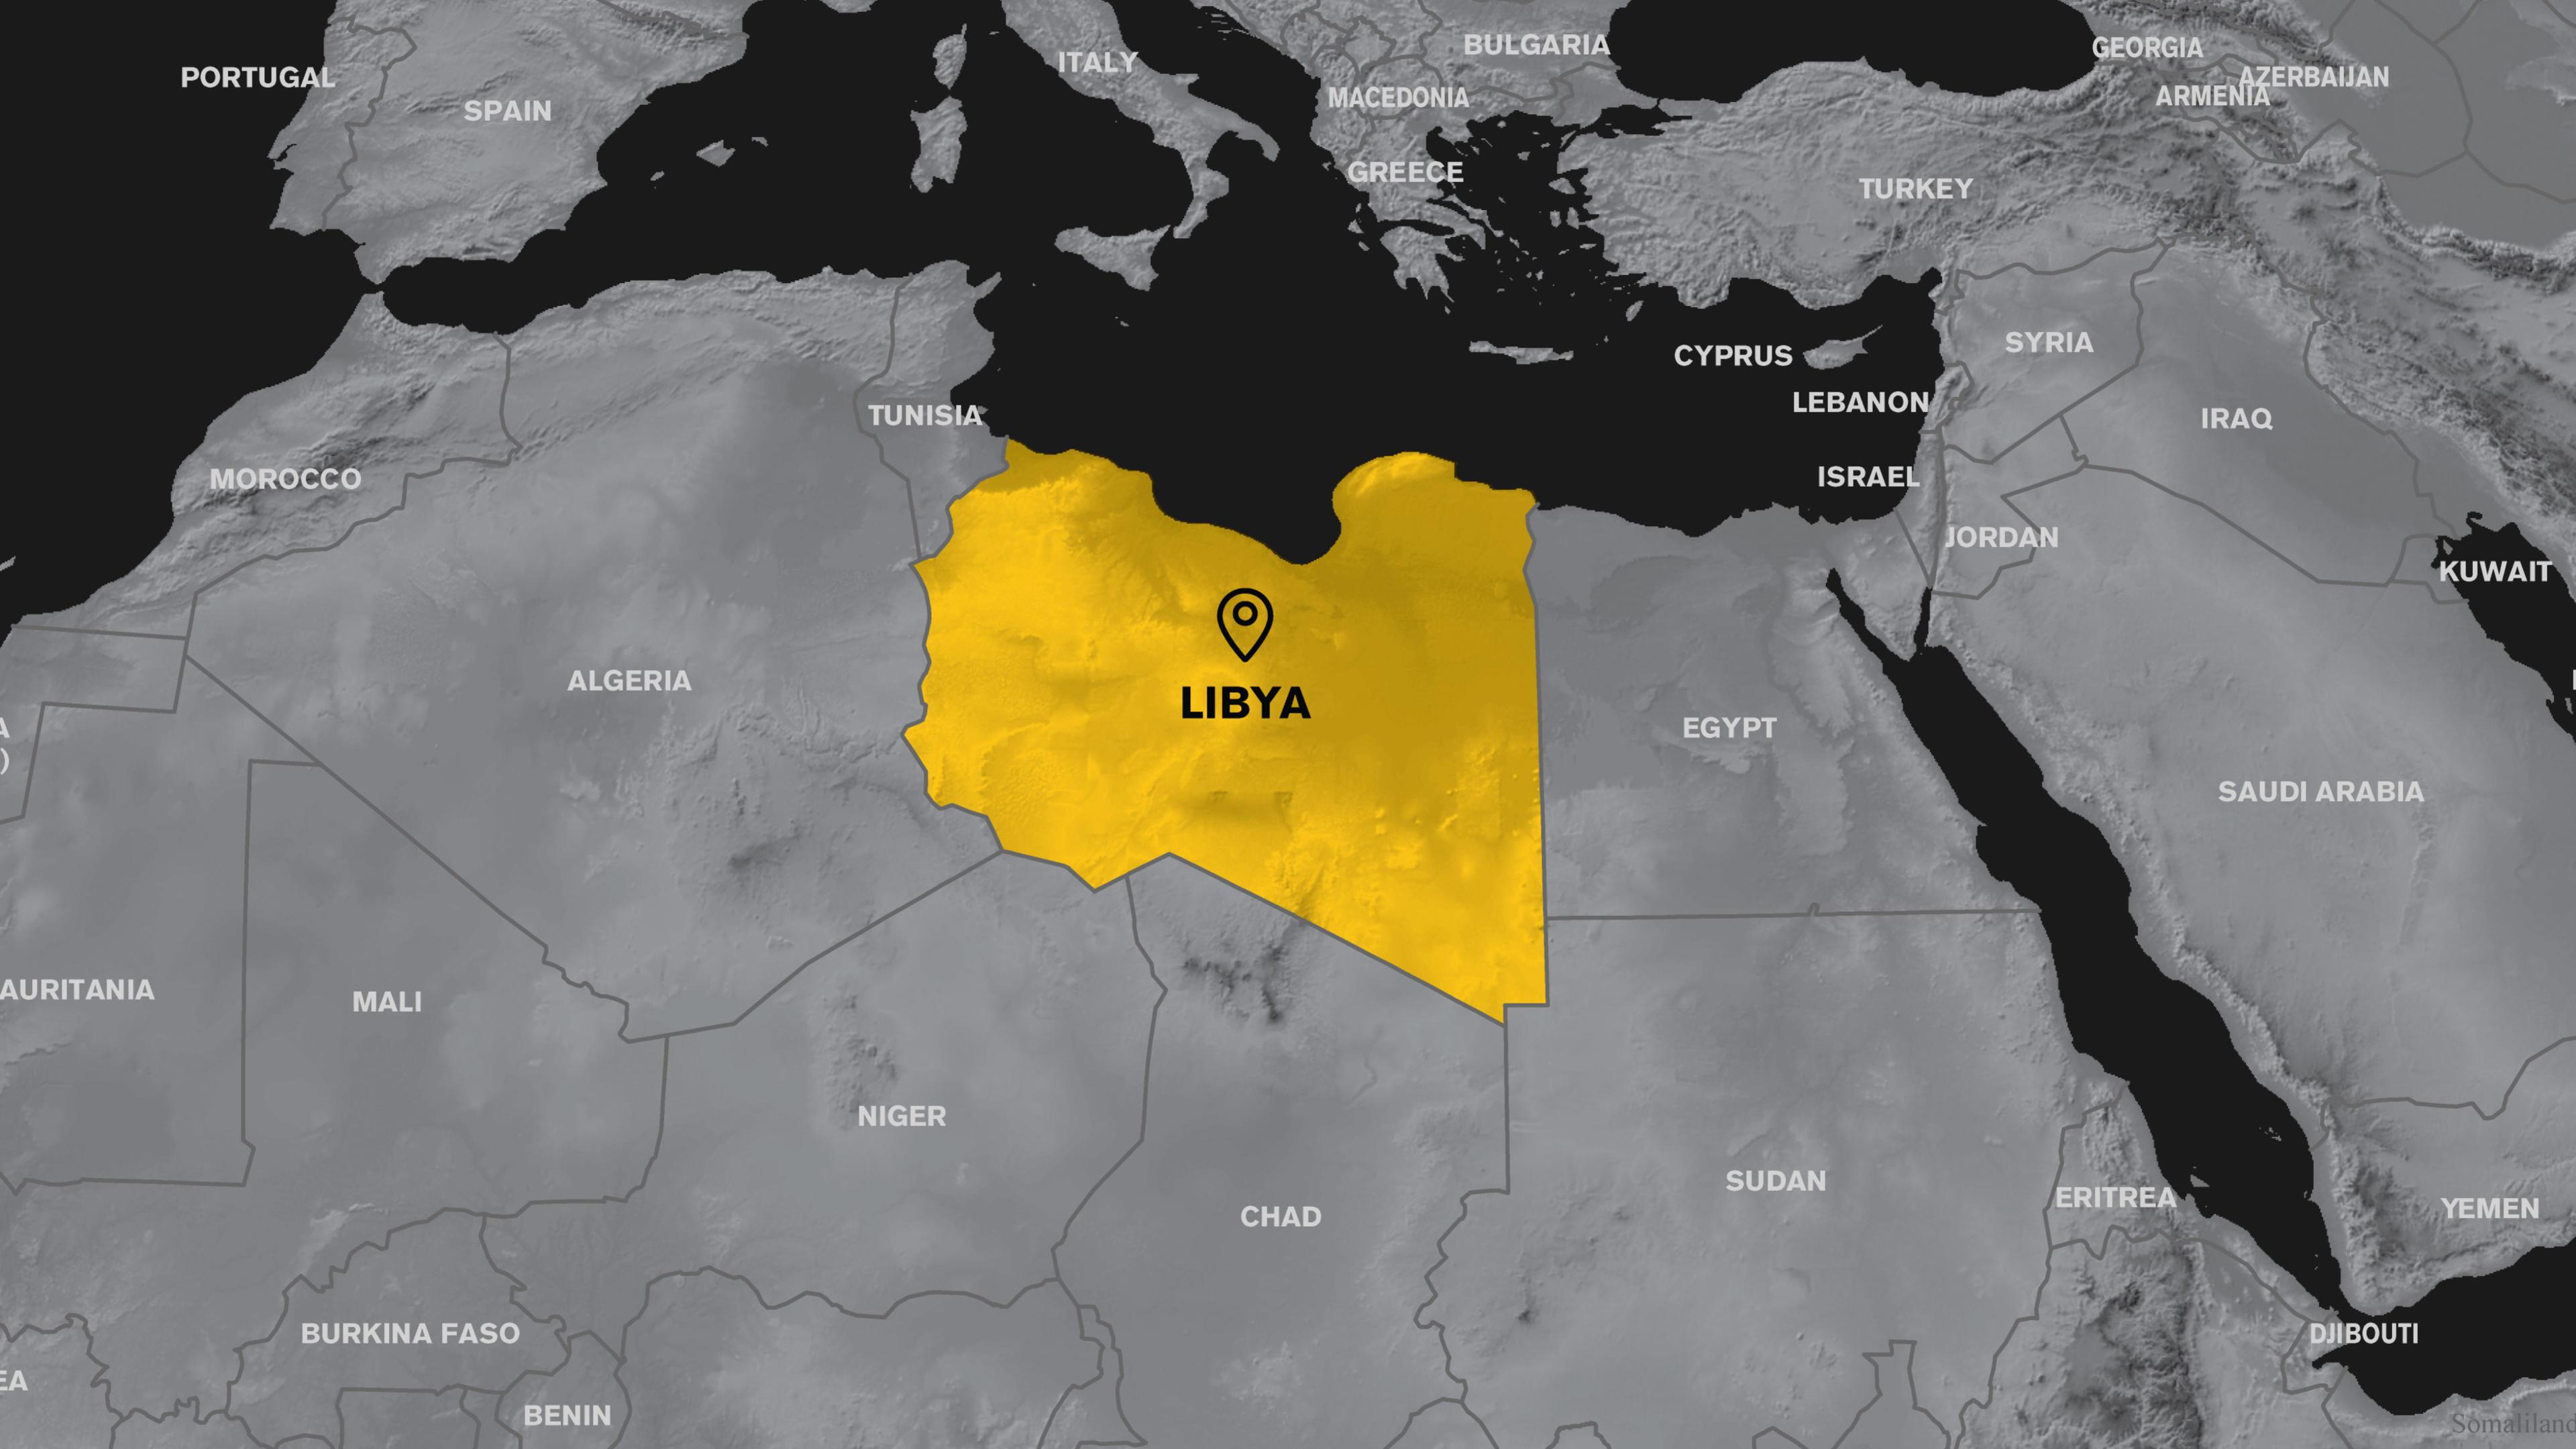 Libya International Rescue Committee IRC